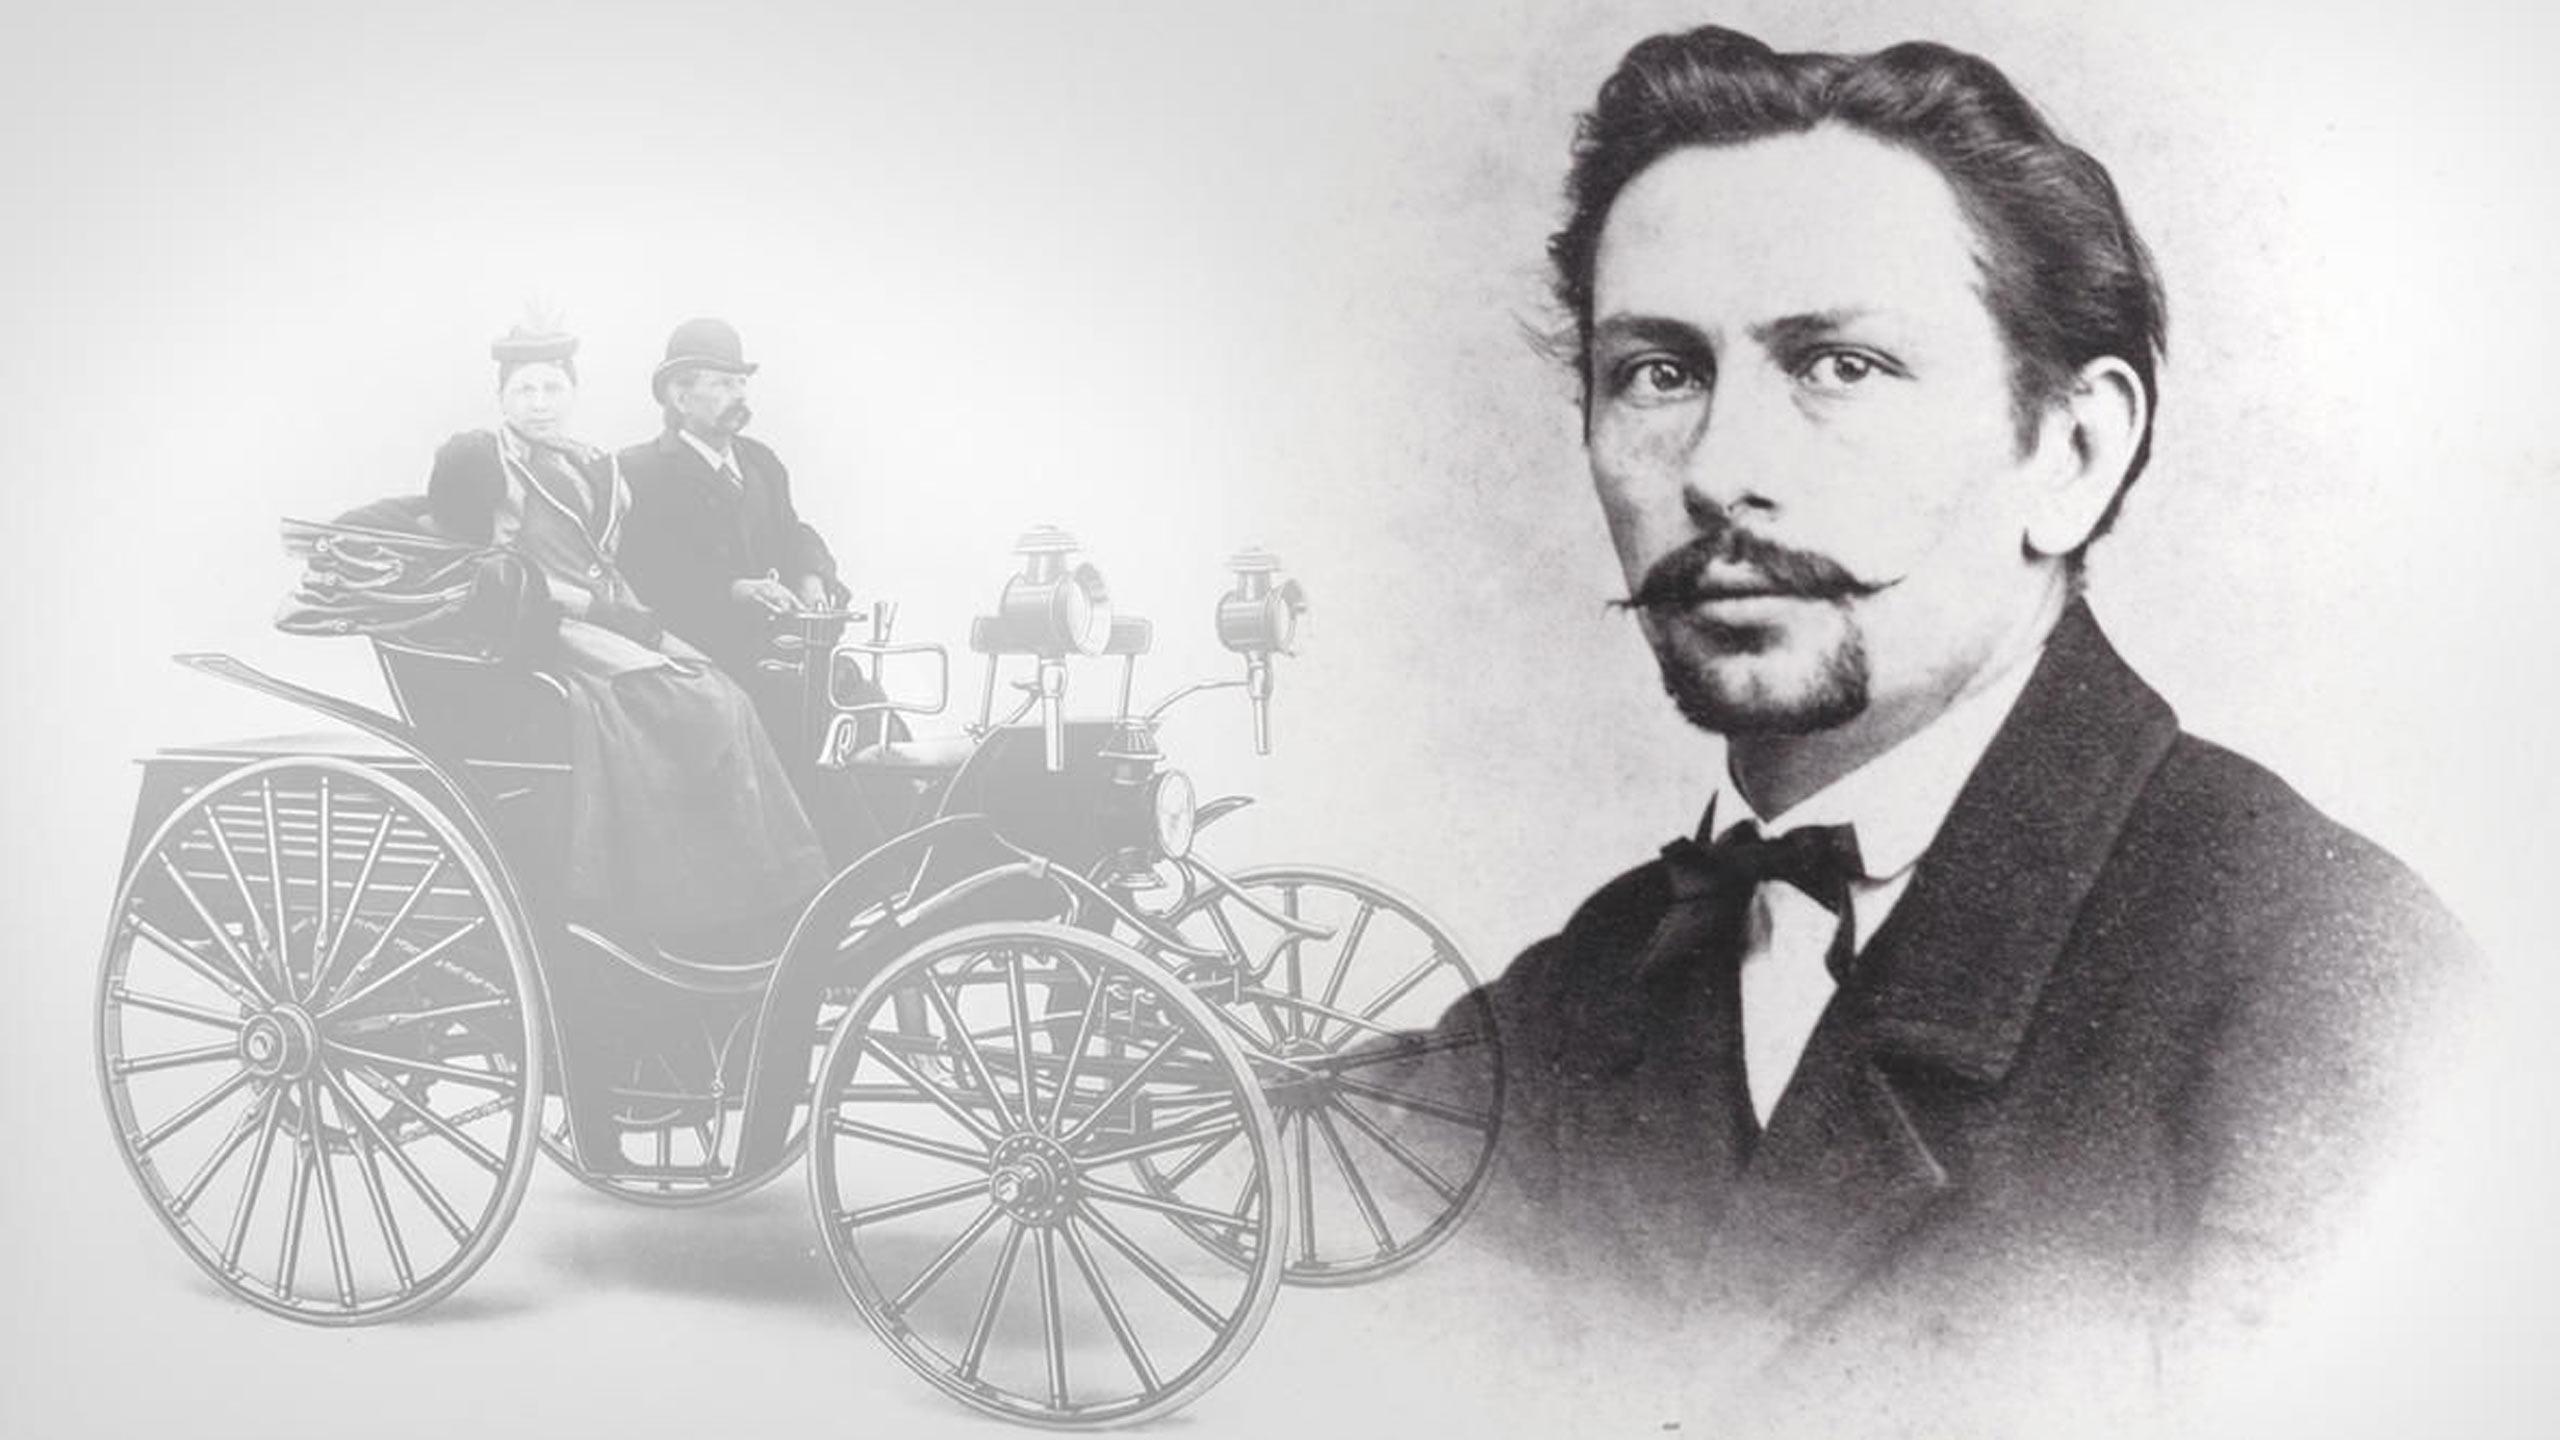 Бенц Карл Фридрих